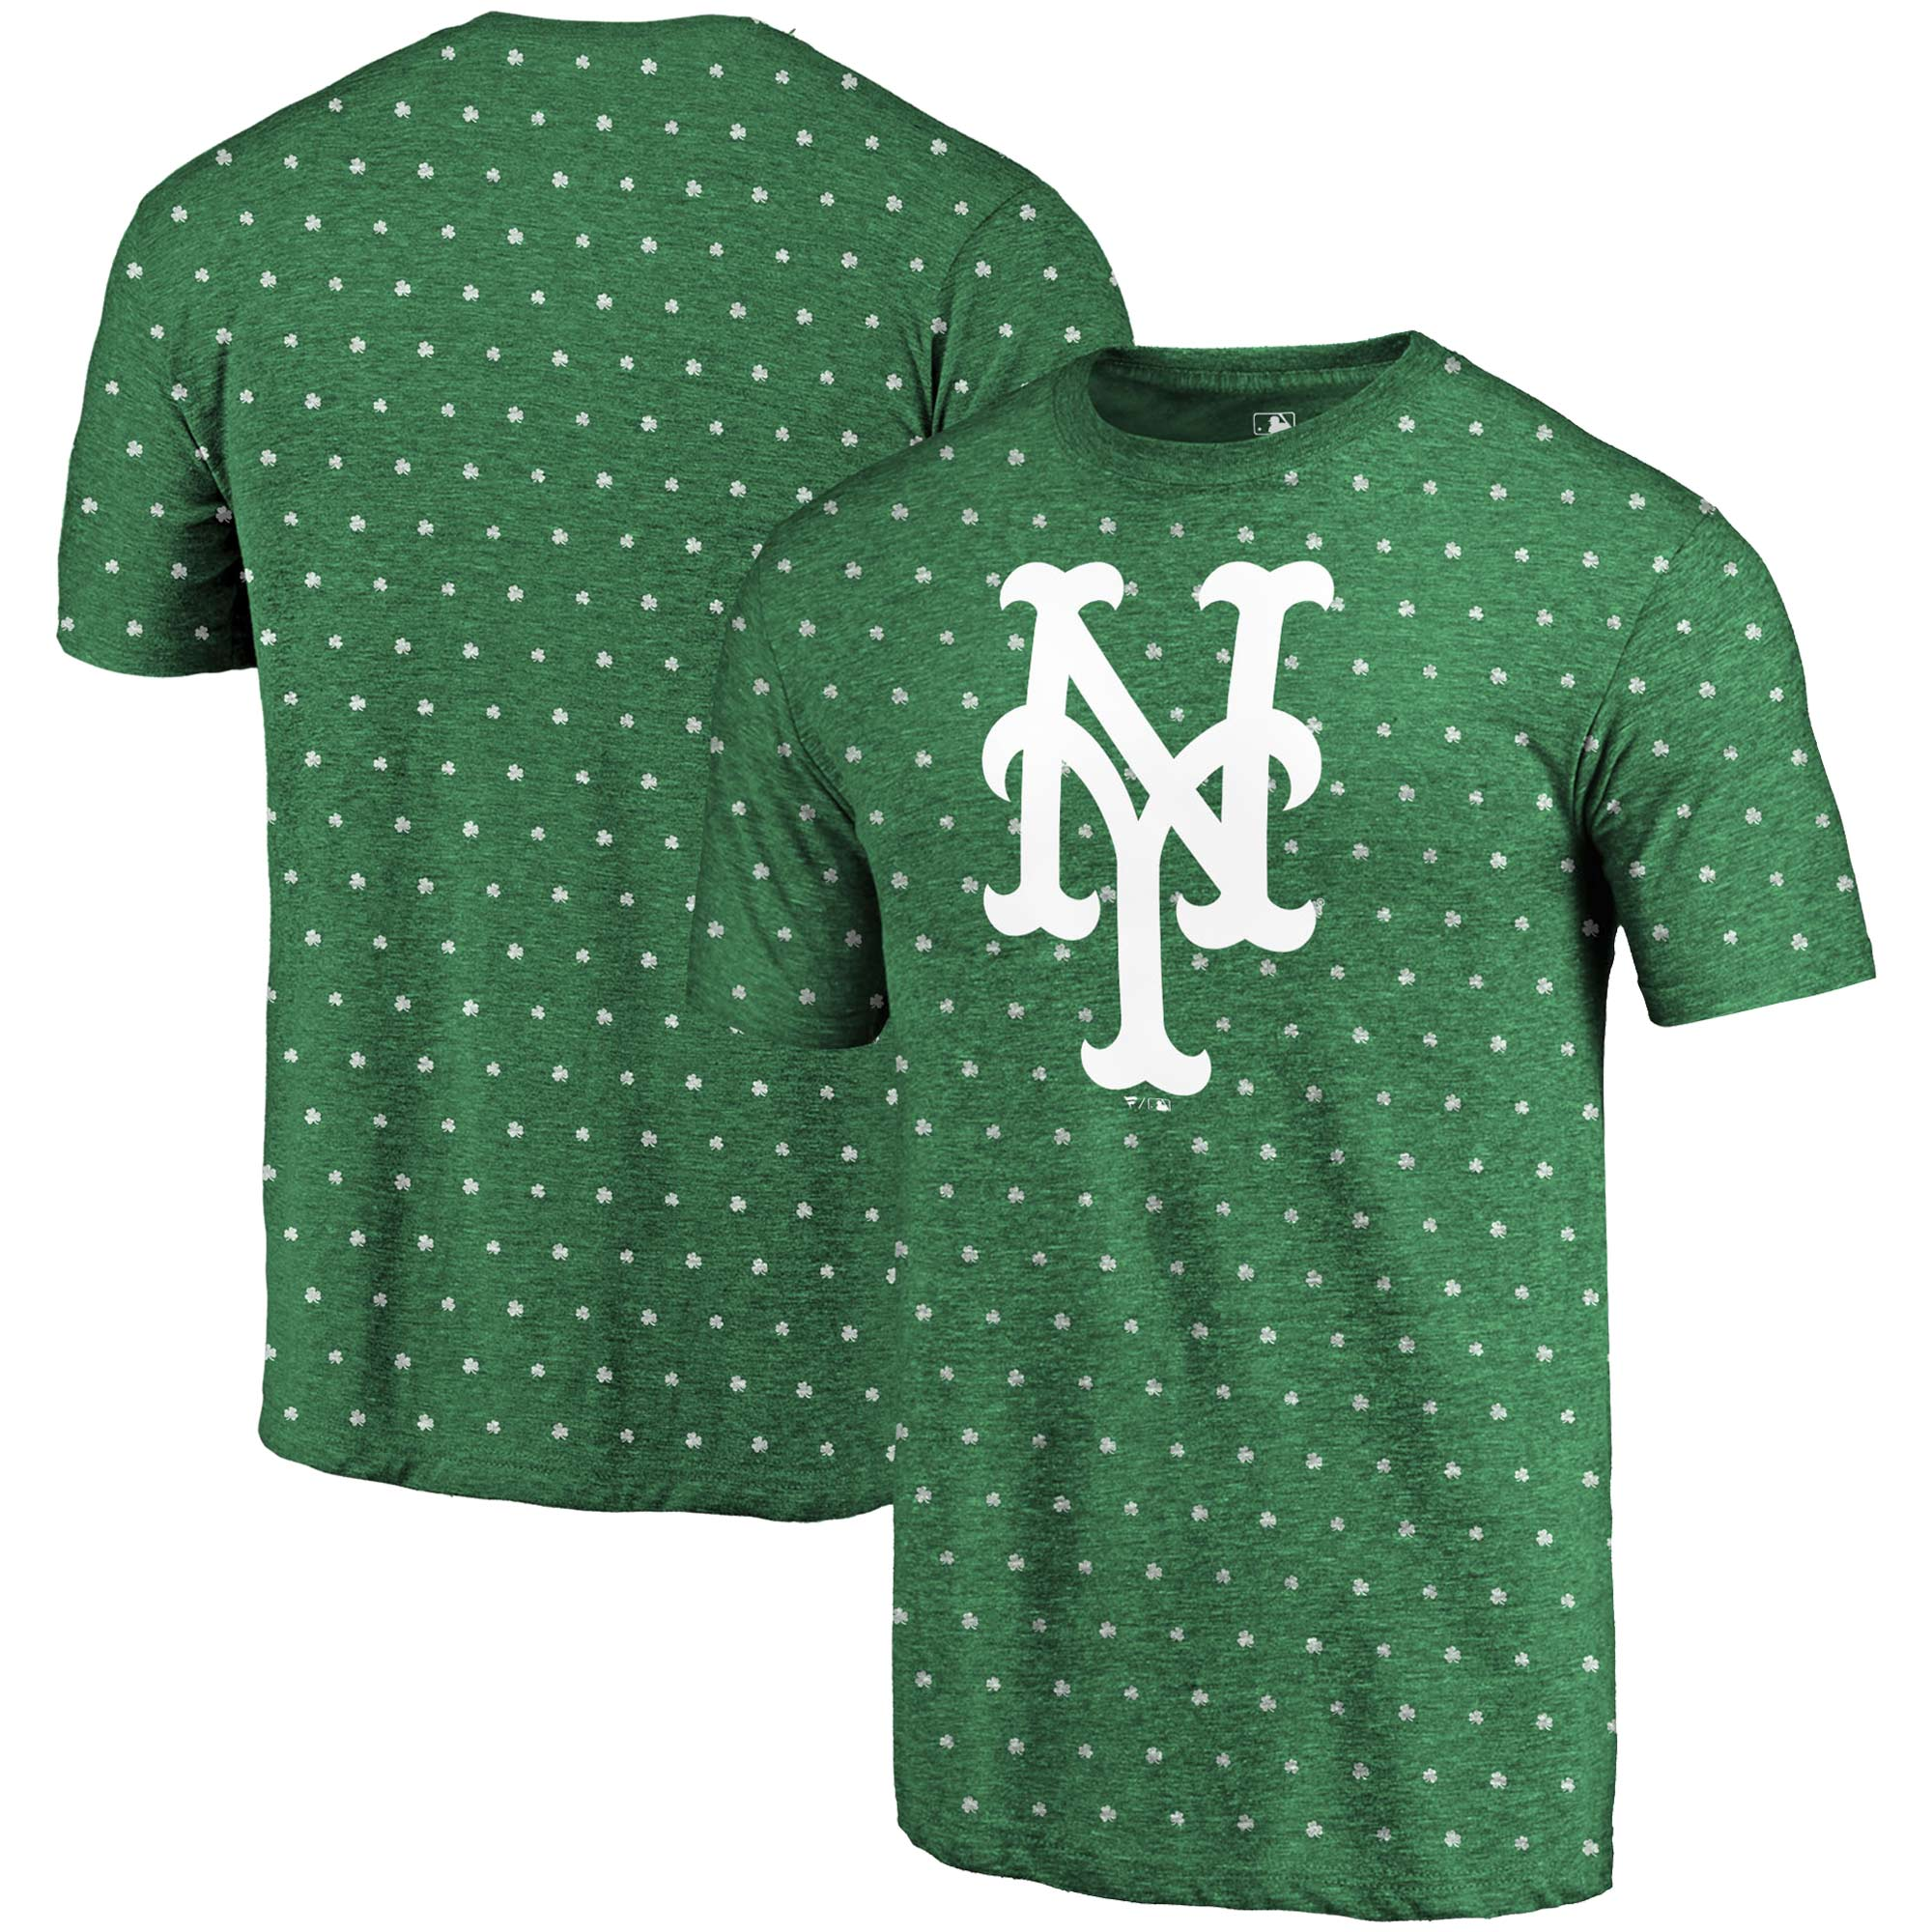 New York Mets Fanatics Branded 2018 St. Patrick's Day All Irish Tri-Blend T-Shirt - Kelly Green